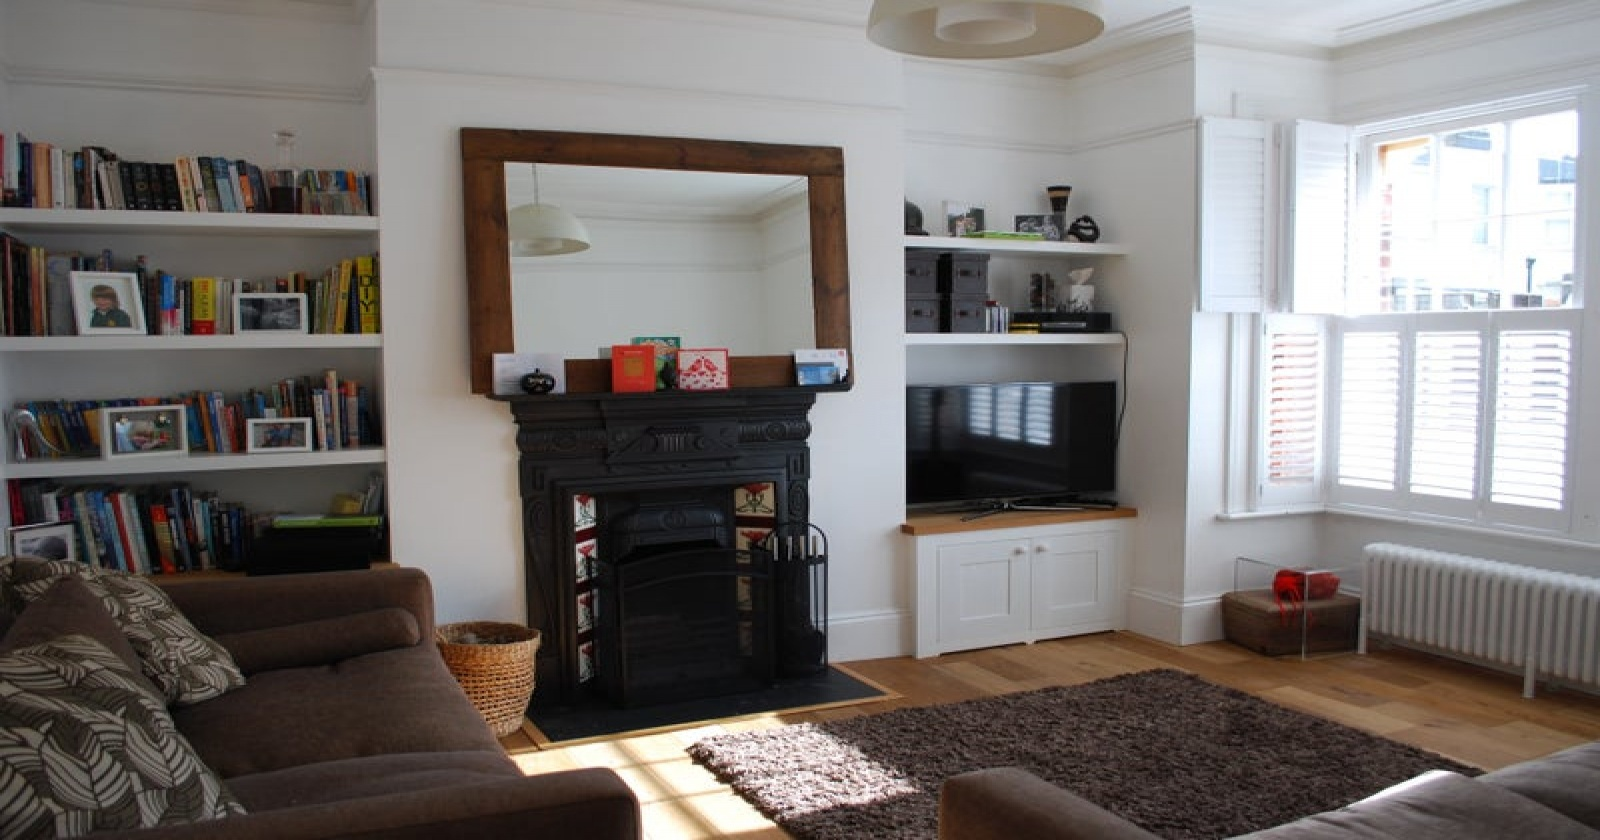 St Andrews Road, Brighton, BN1 6EN, 1 Room Rooms,1 BathroomBathrooms,Room,For Rent,St Andrews Road,1,1008